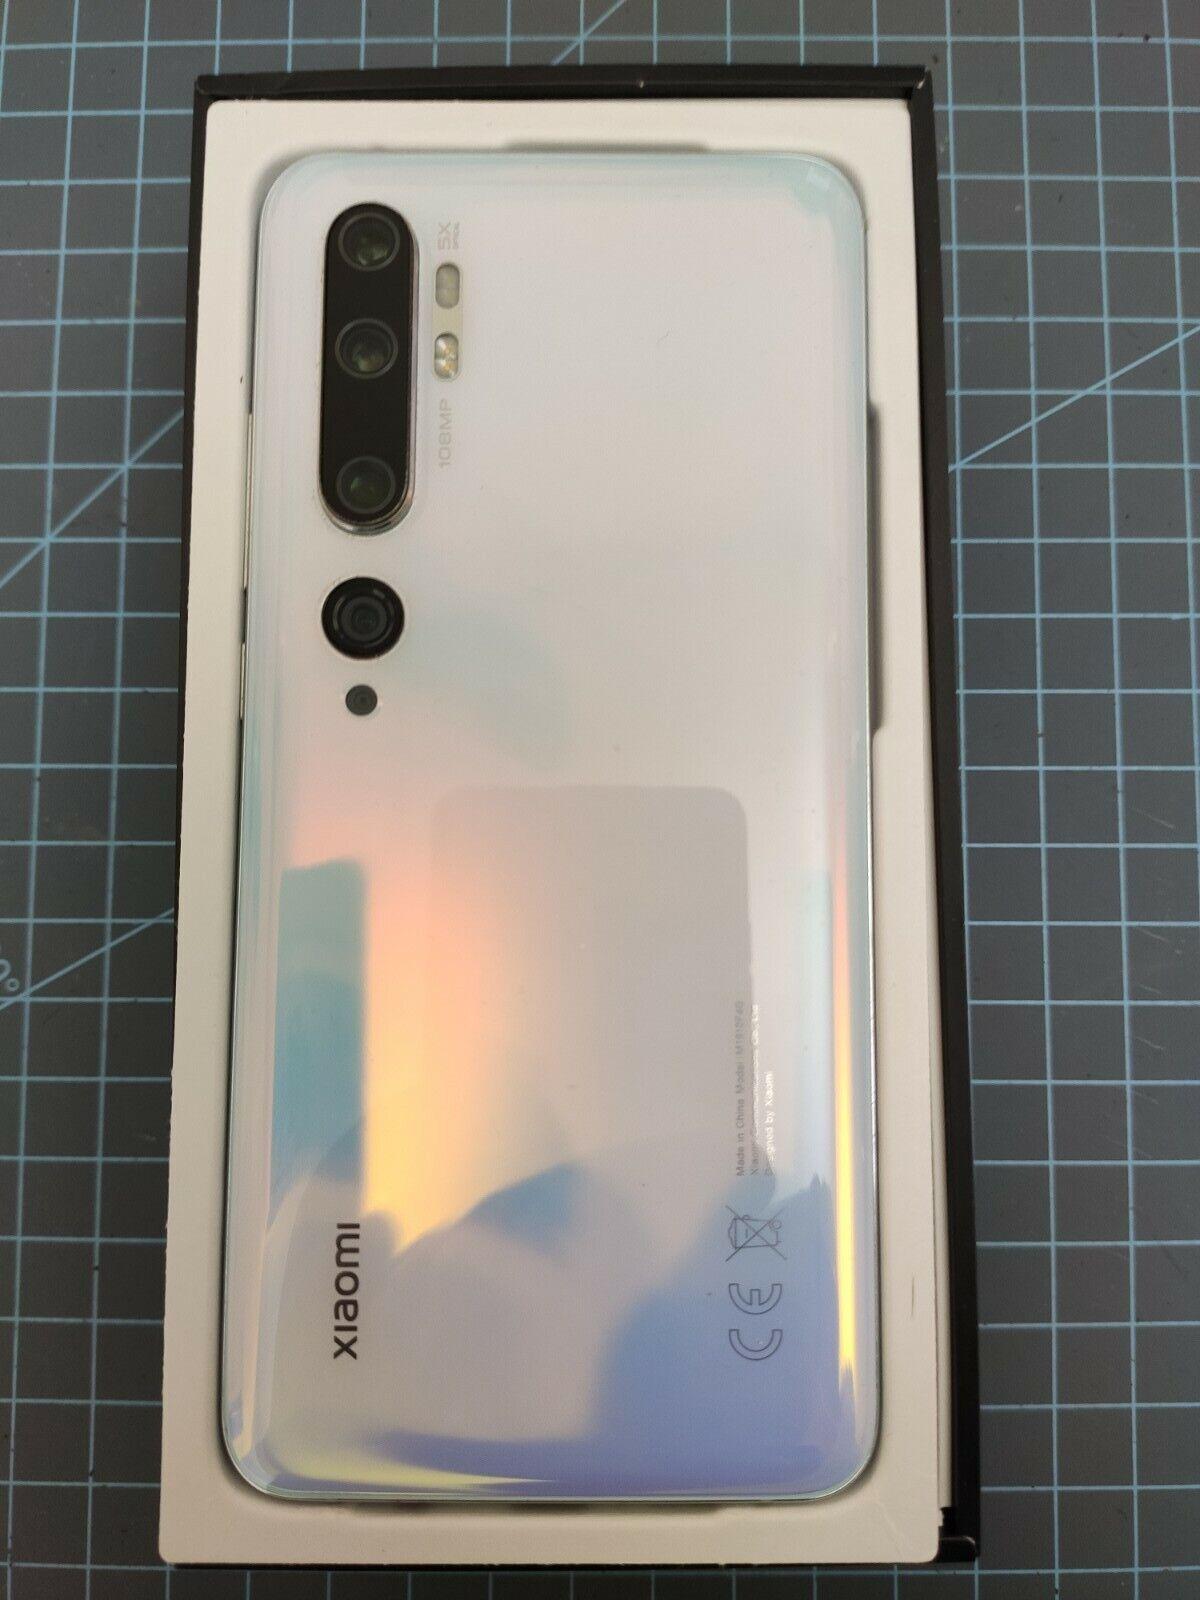 Xiaomi Mi Note 10 128GB Glacier White Unlocked Smartphone, Very Lightly Used - $260.00